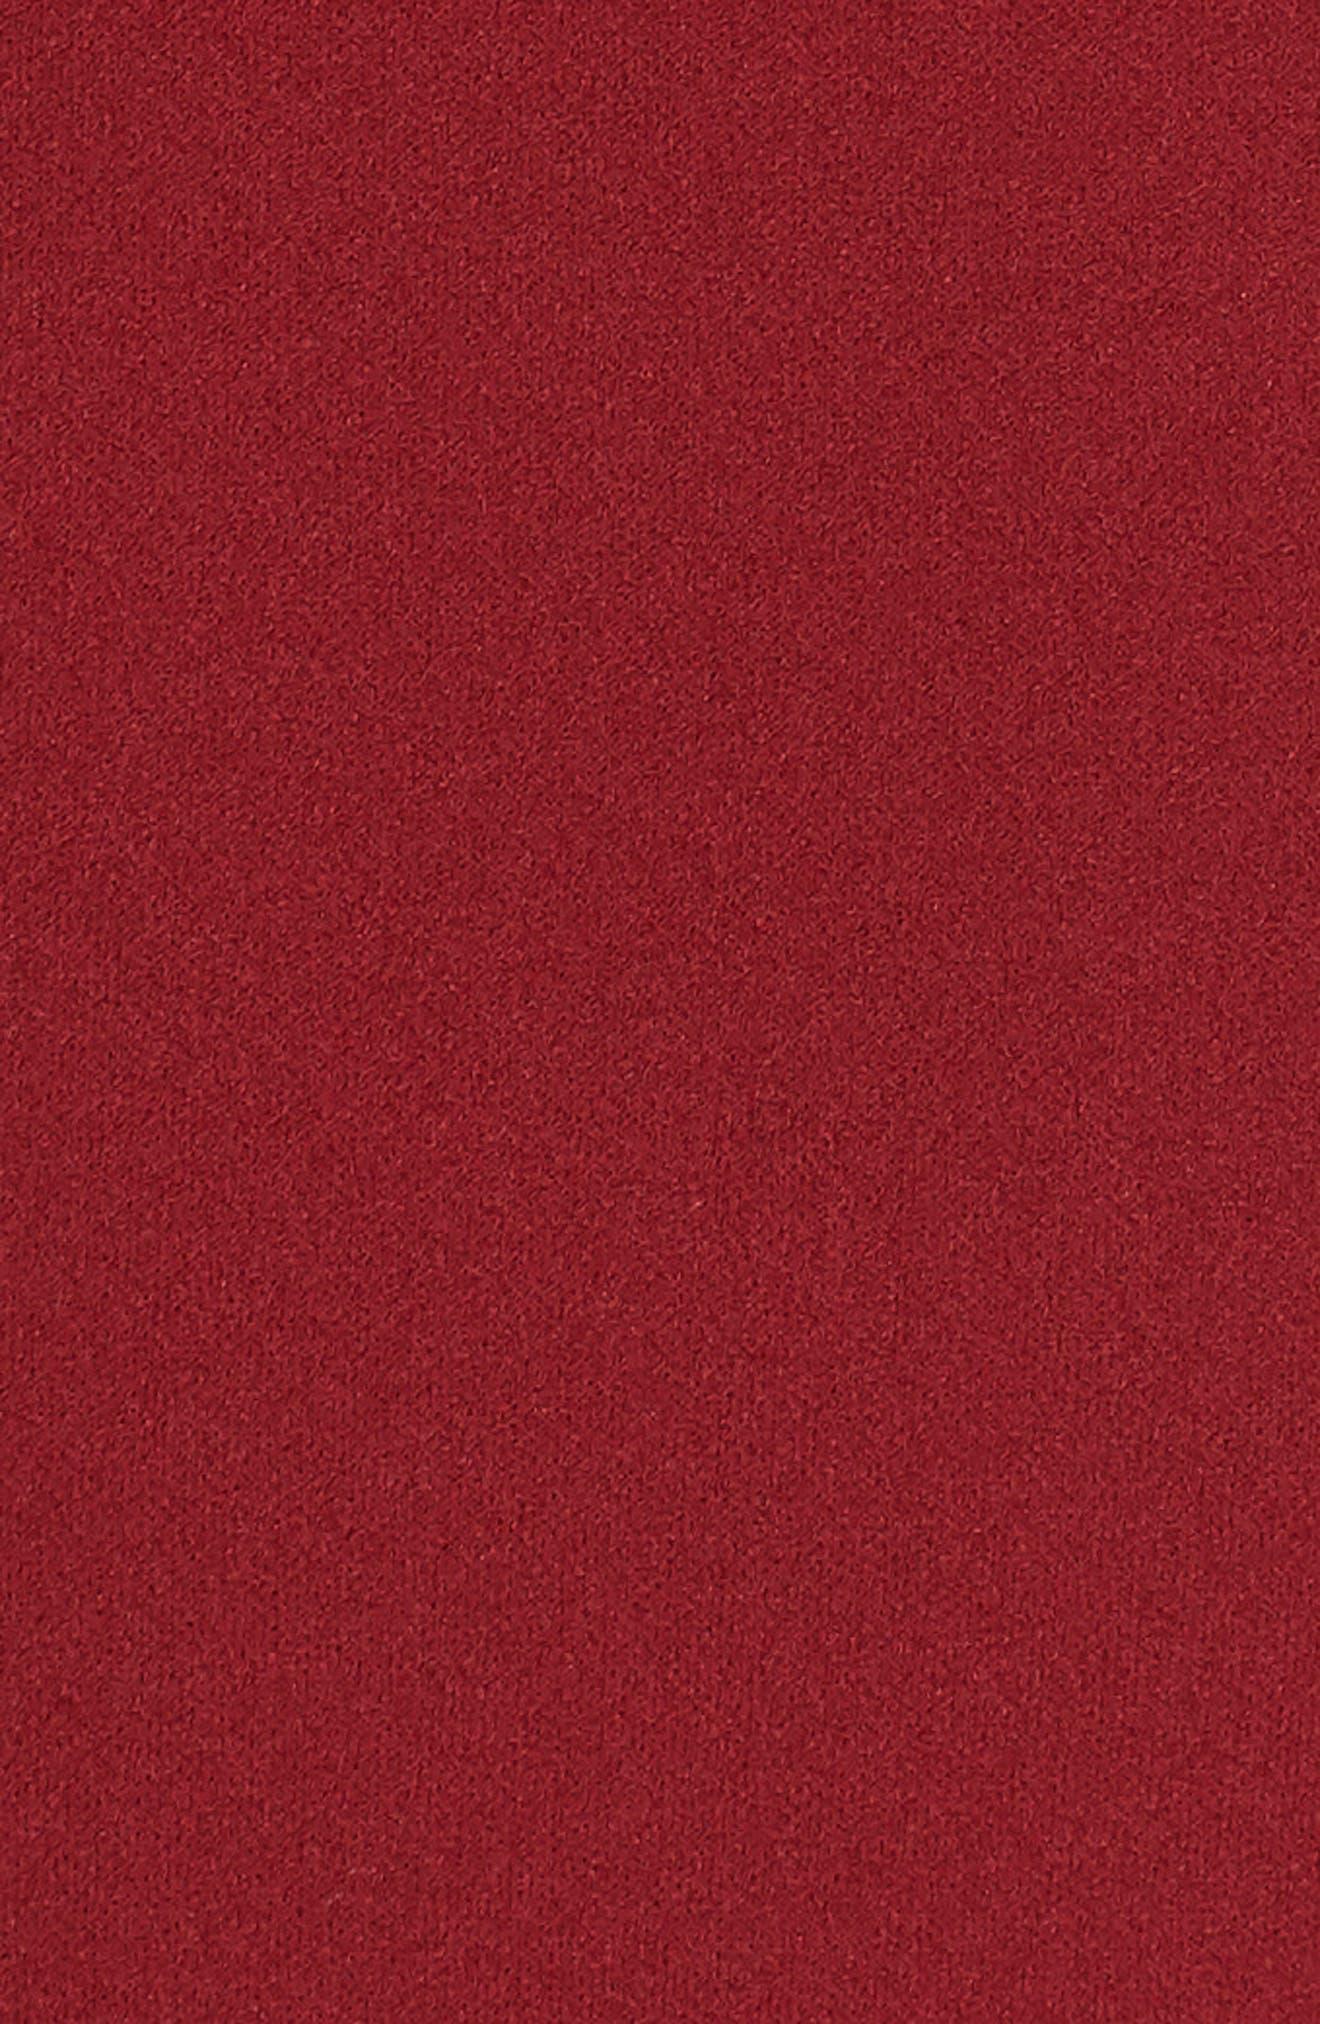 LULUS, Thrive Racerback Minidress, Alternate thumbnail 6, color, 930